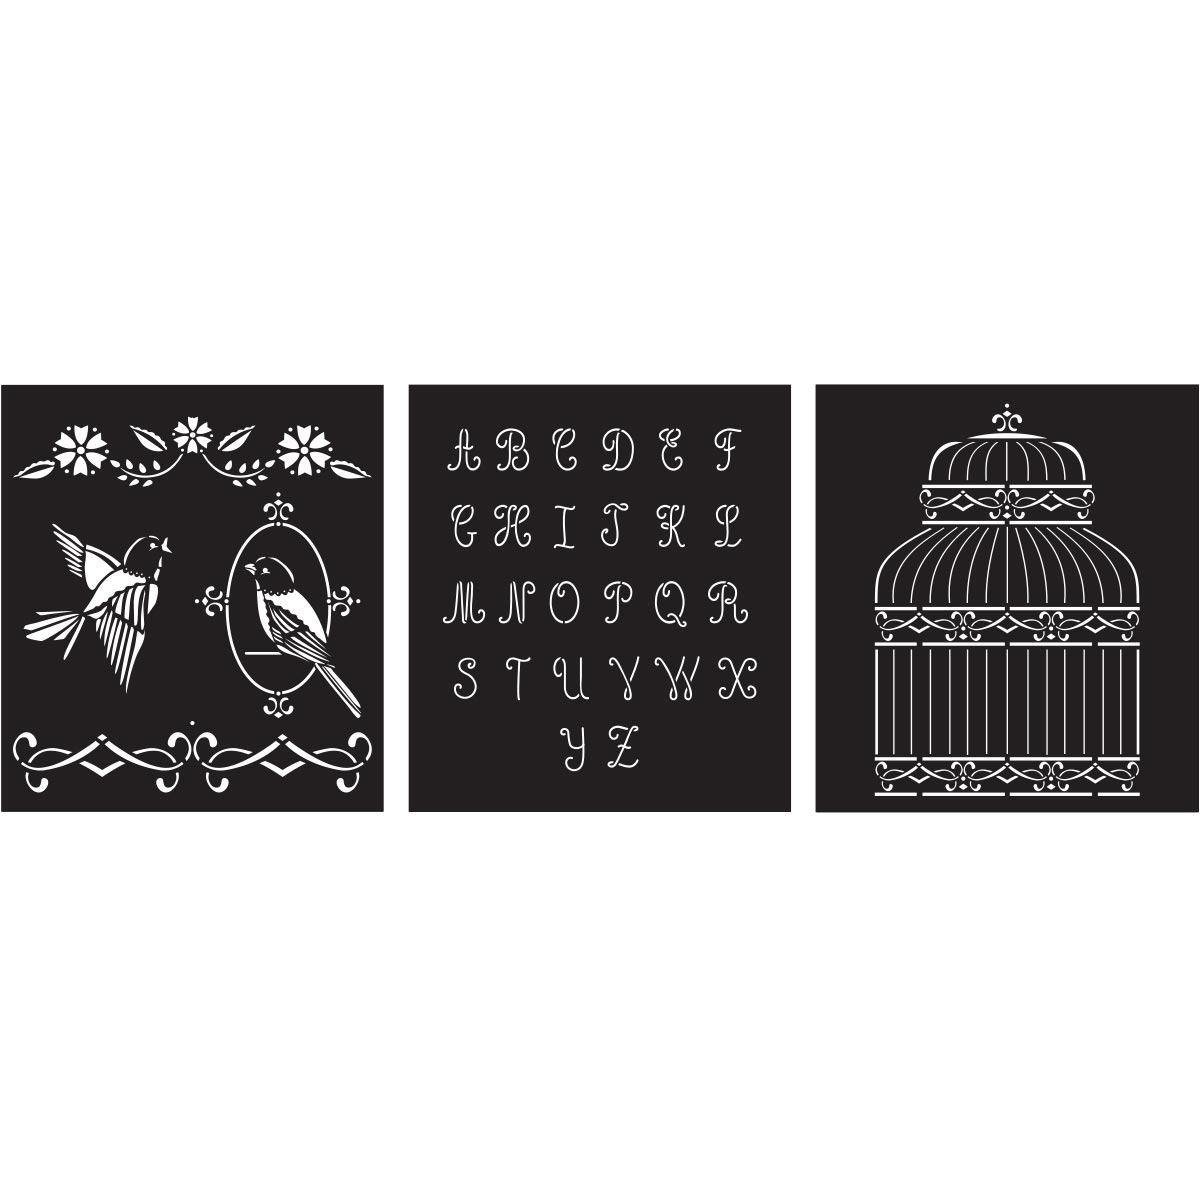 FolkArt ® Craft Stencils - Value Packs - Birdcage